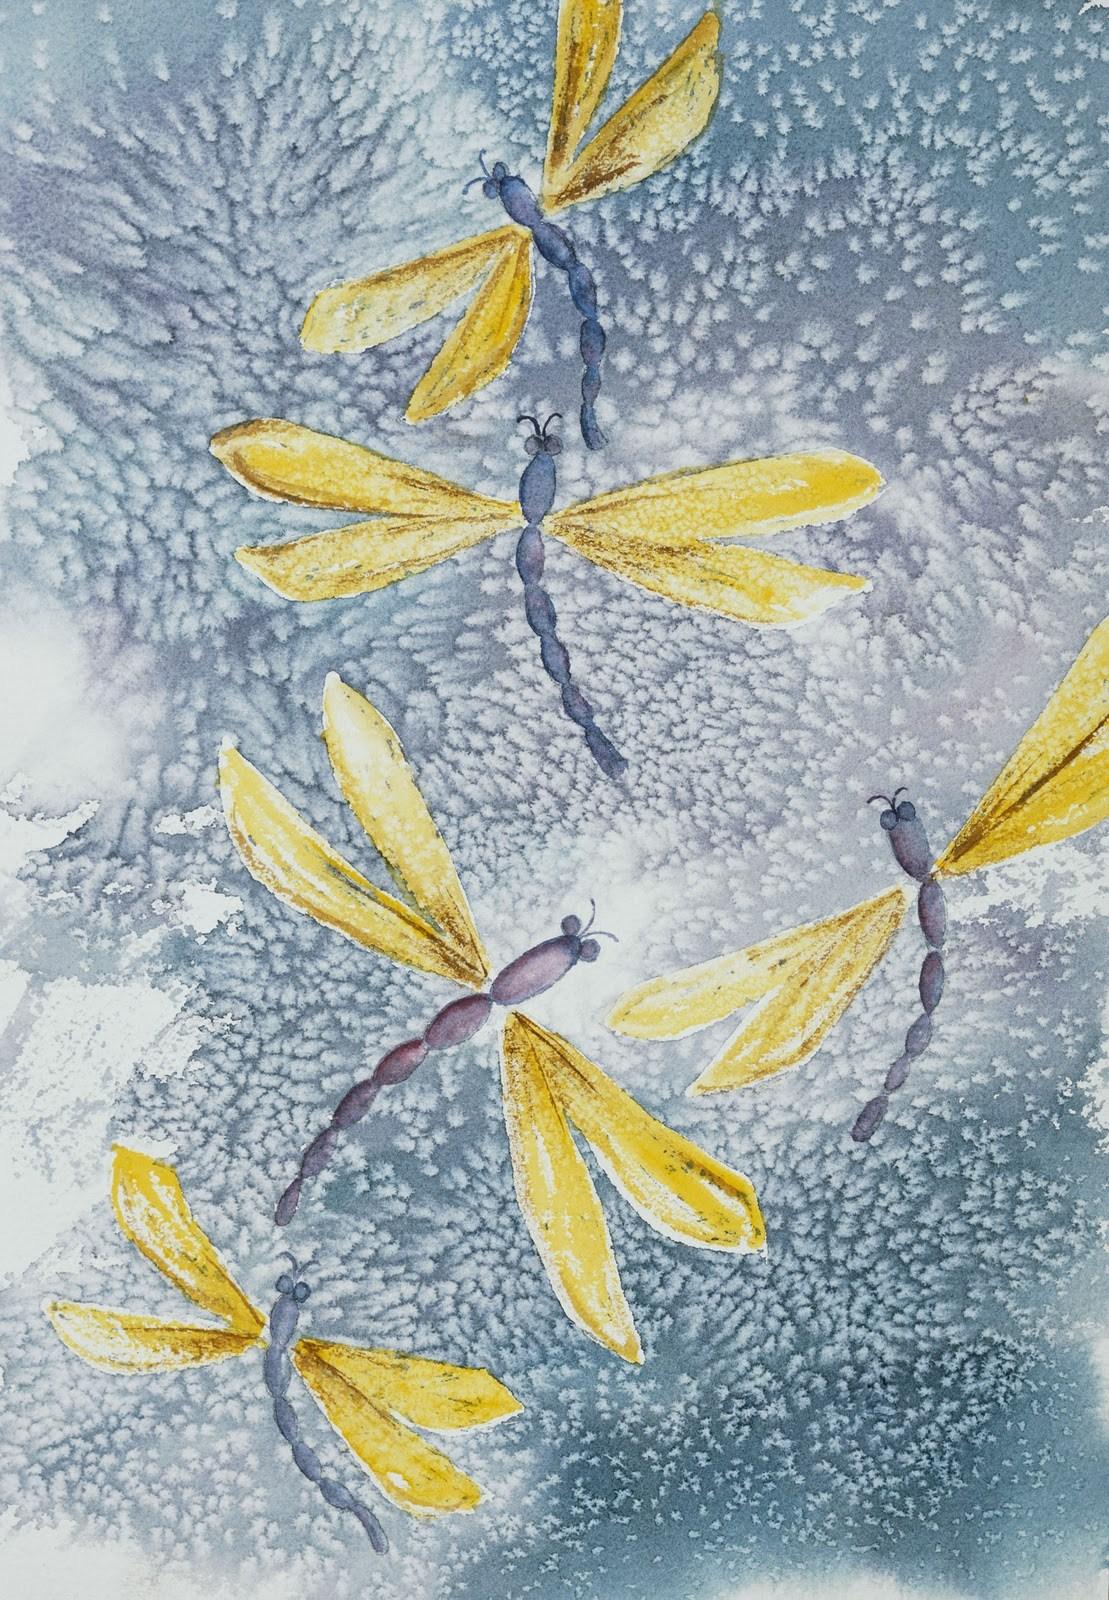 """Dragonfly Fantasy"" original fine art by Michelle Wolfe"